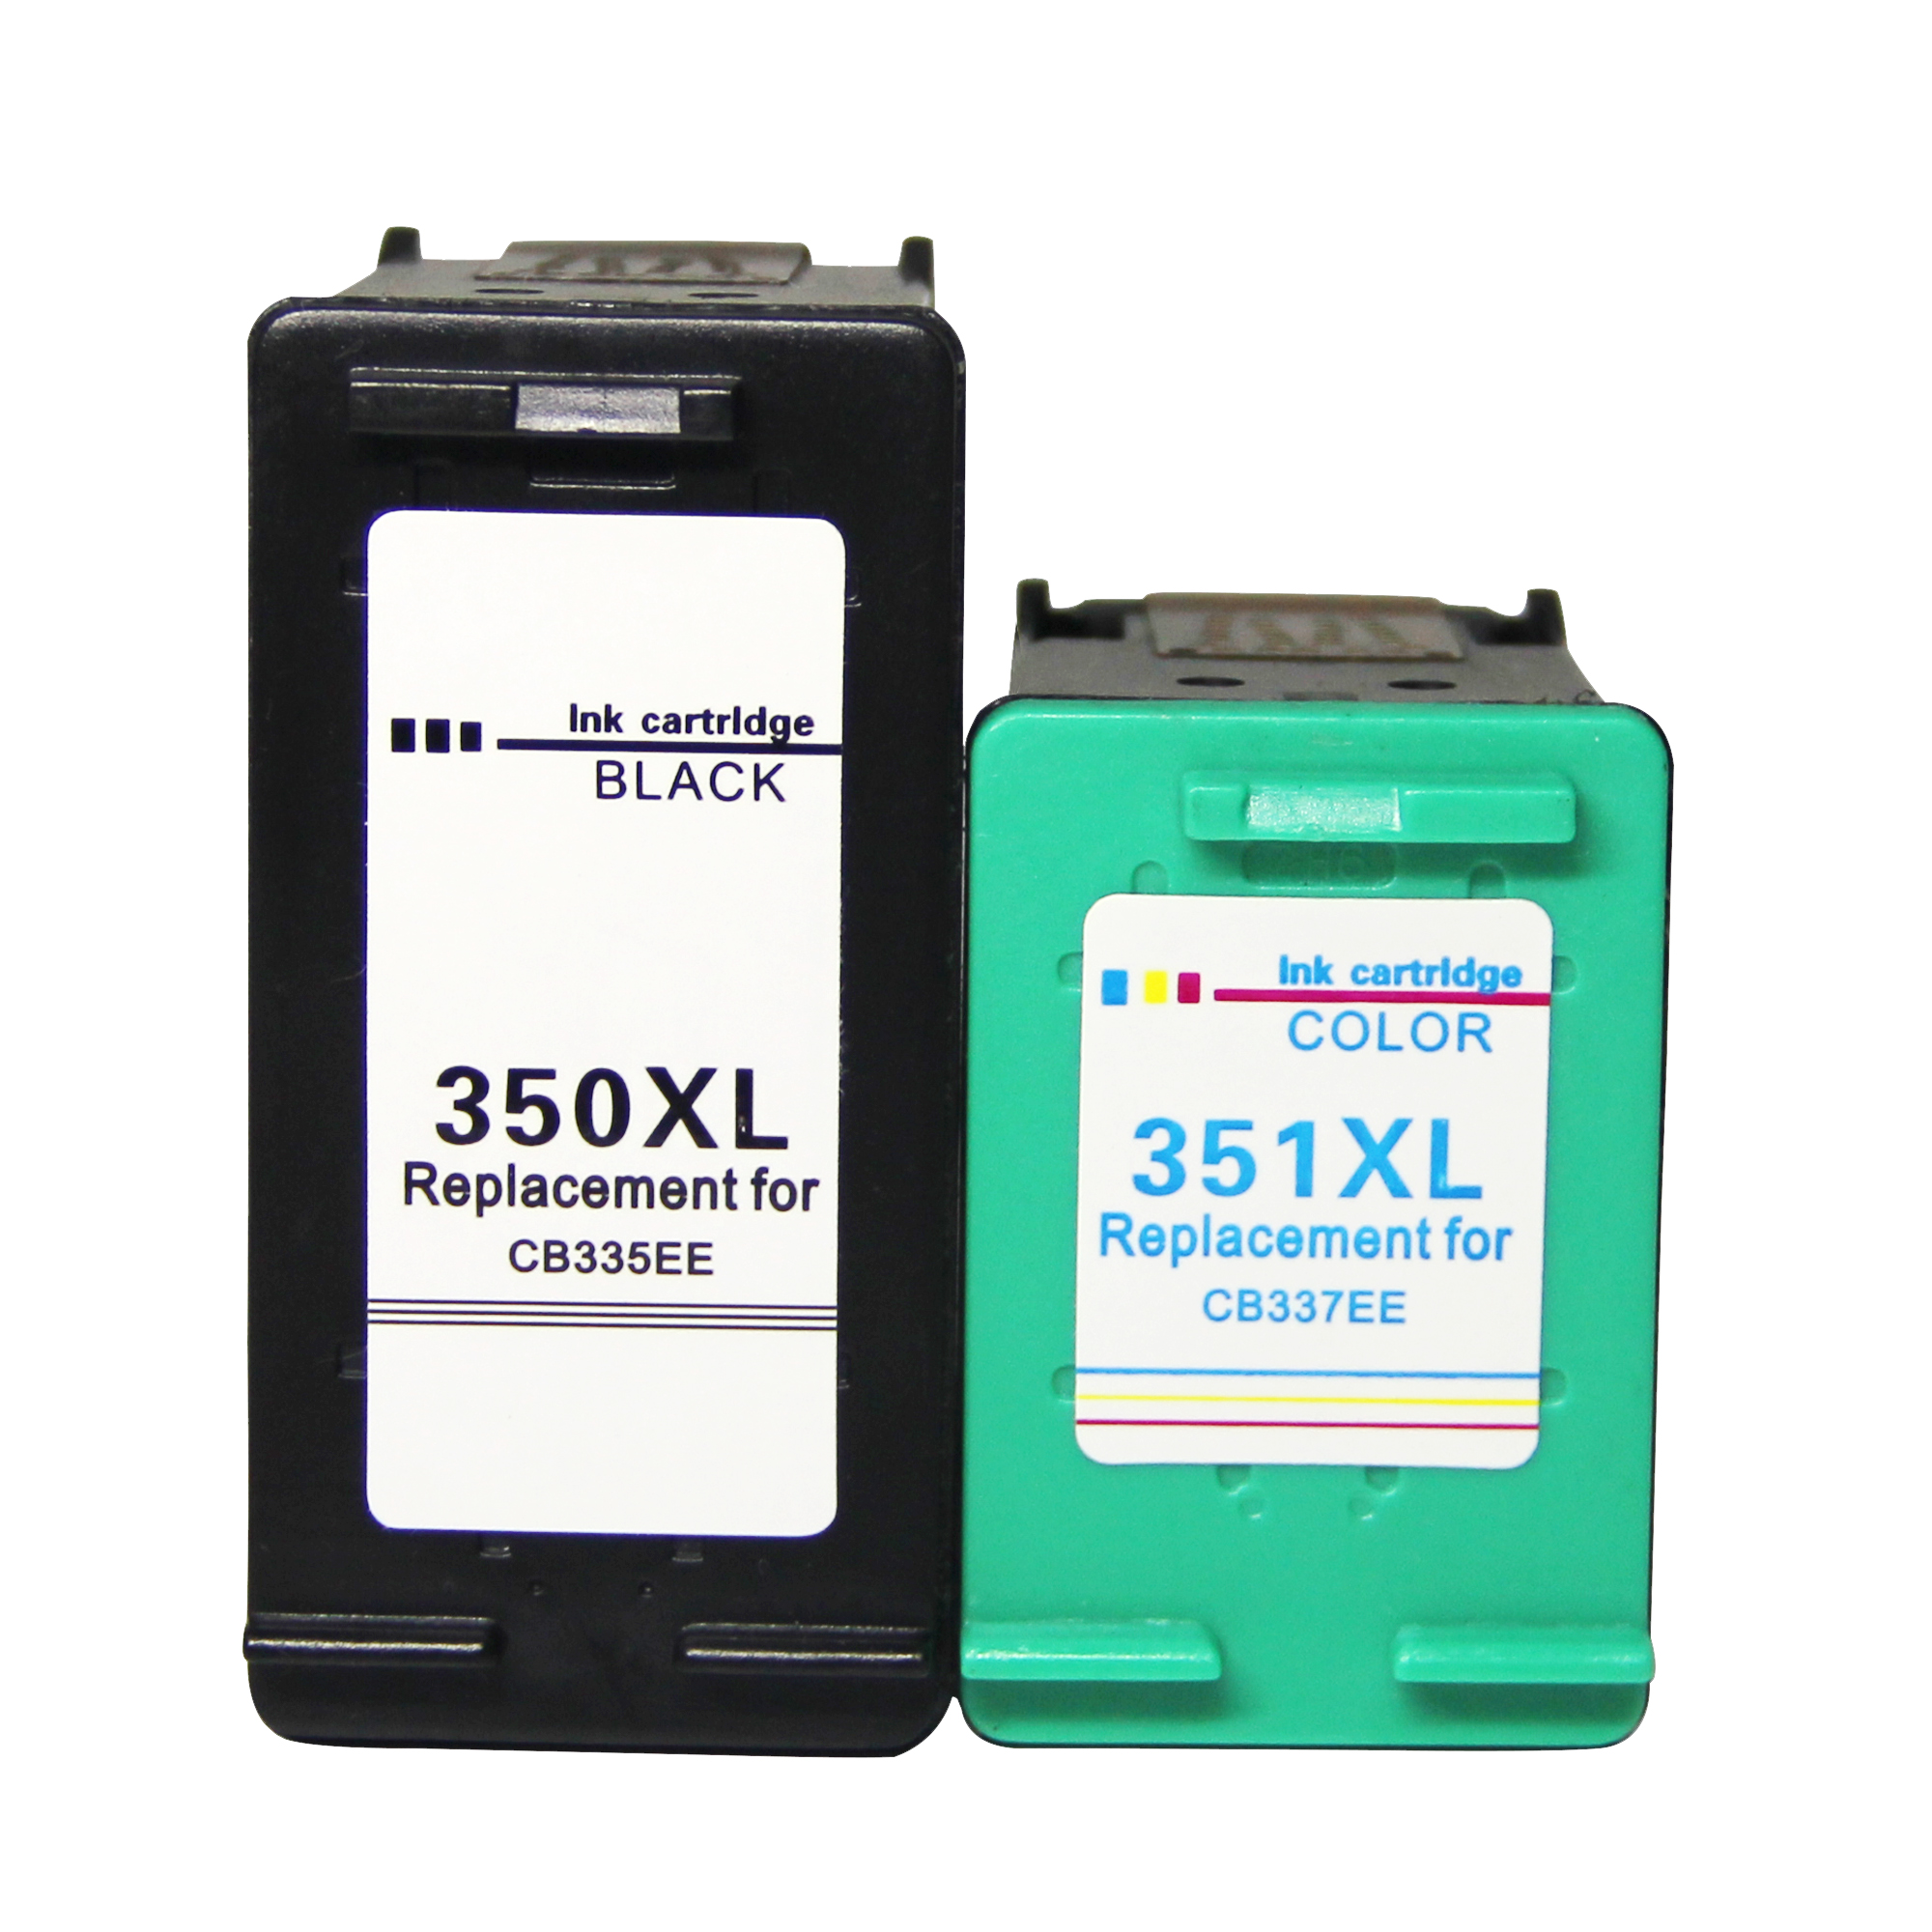 350XL 351XL Cartuchos de tinta Remanufacturado HP 350 351 para HP Deskjet serie D4260 Officejet J5780 J6410 HP Photosmar C4200 C4270